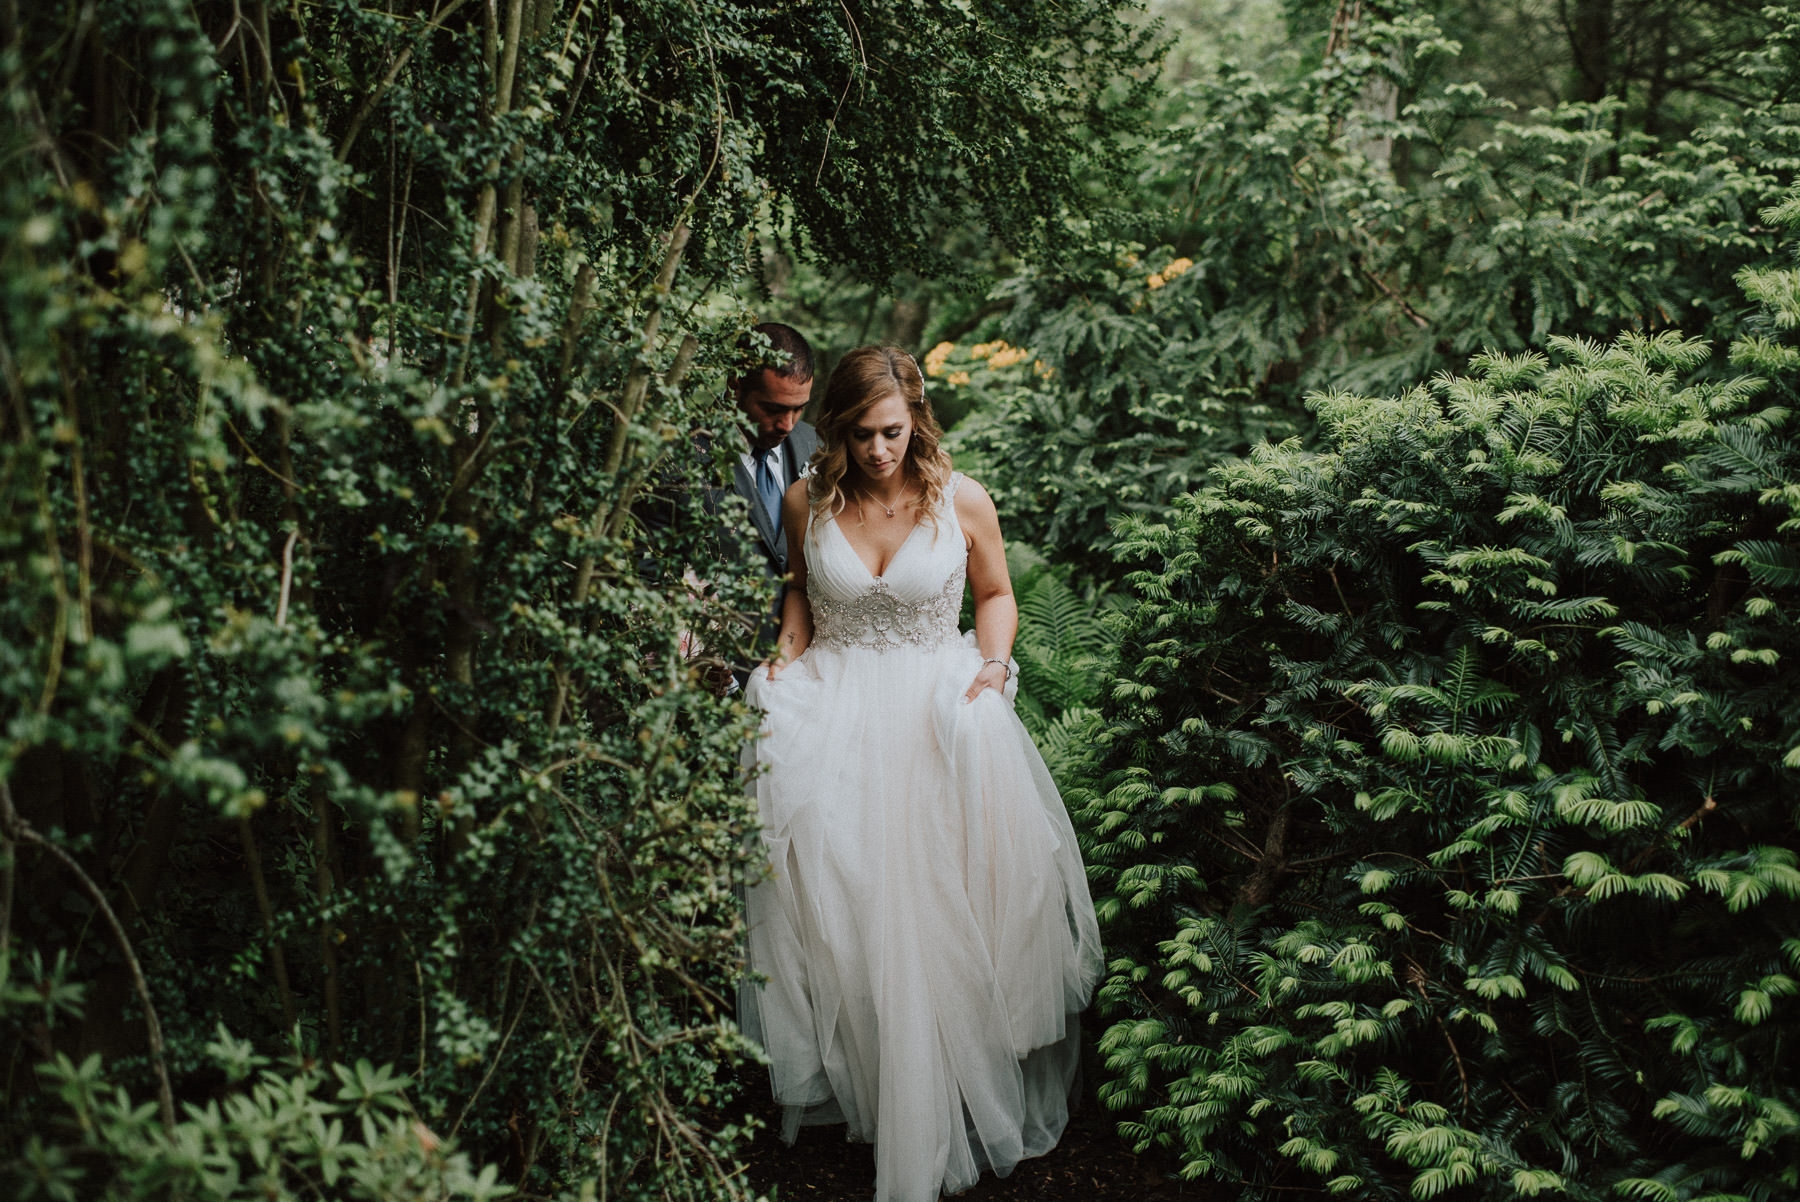 appleford-estate-wedding-photography-38.jpg